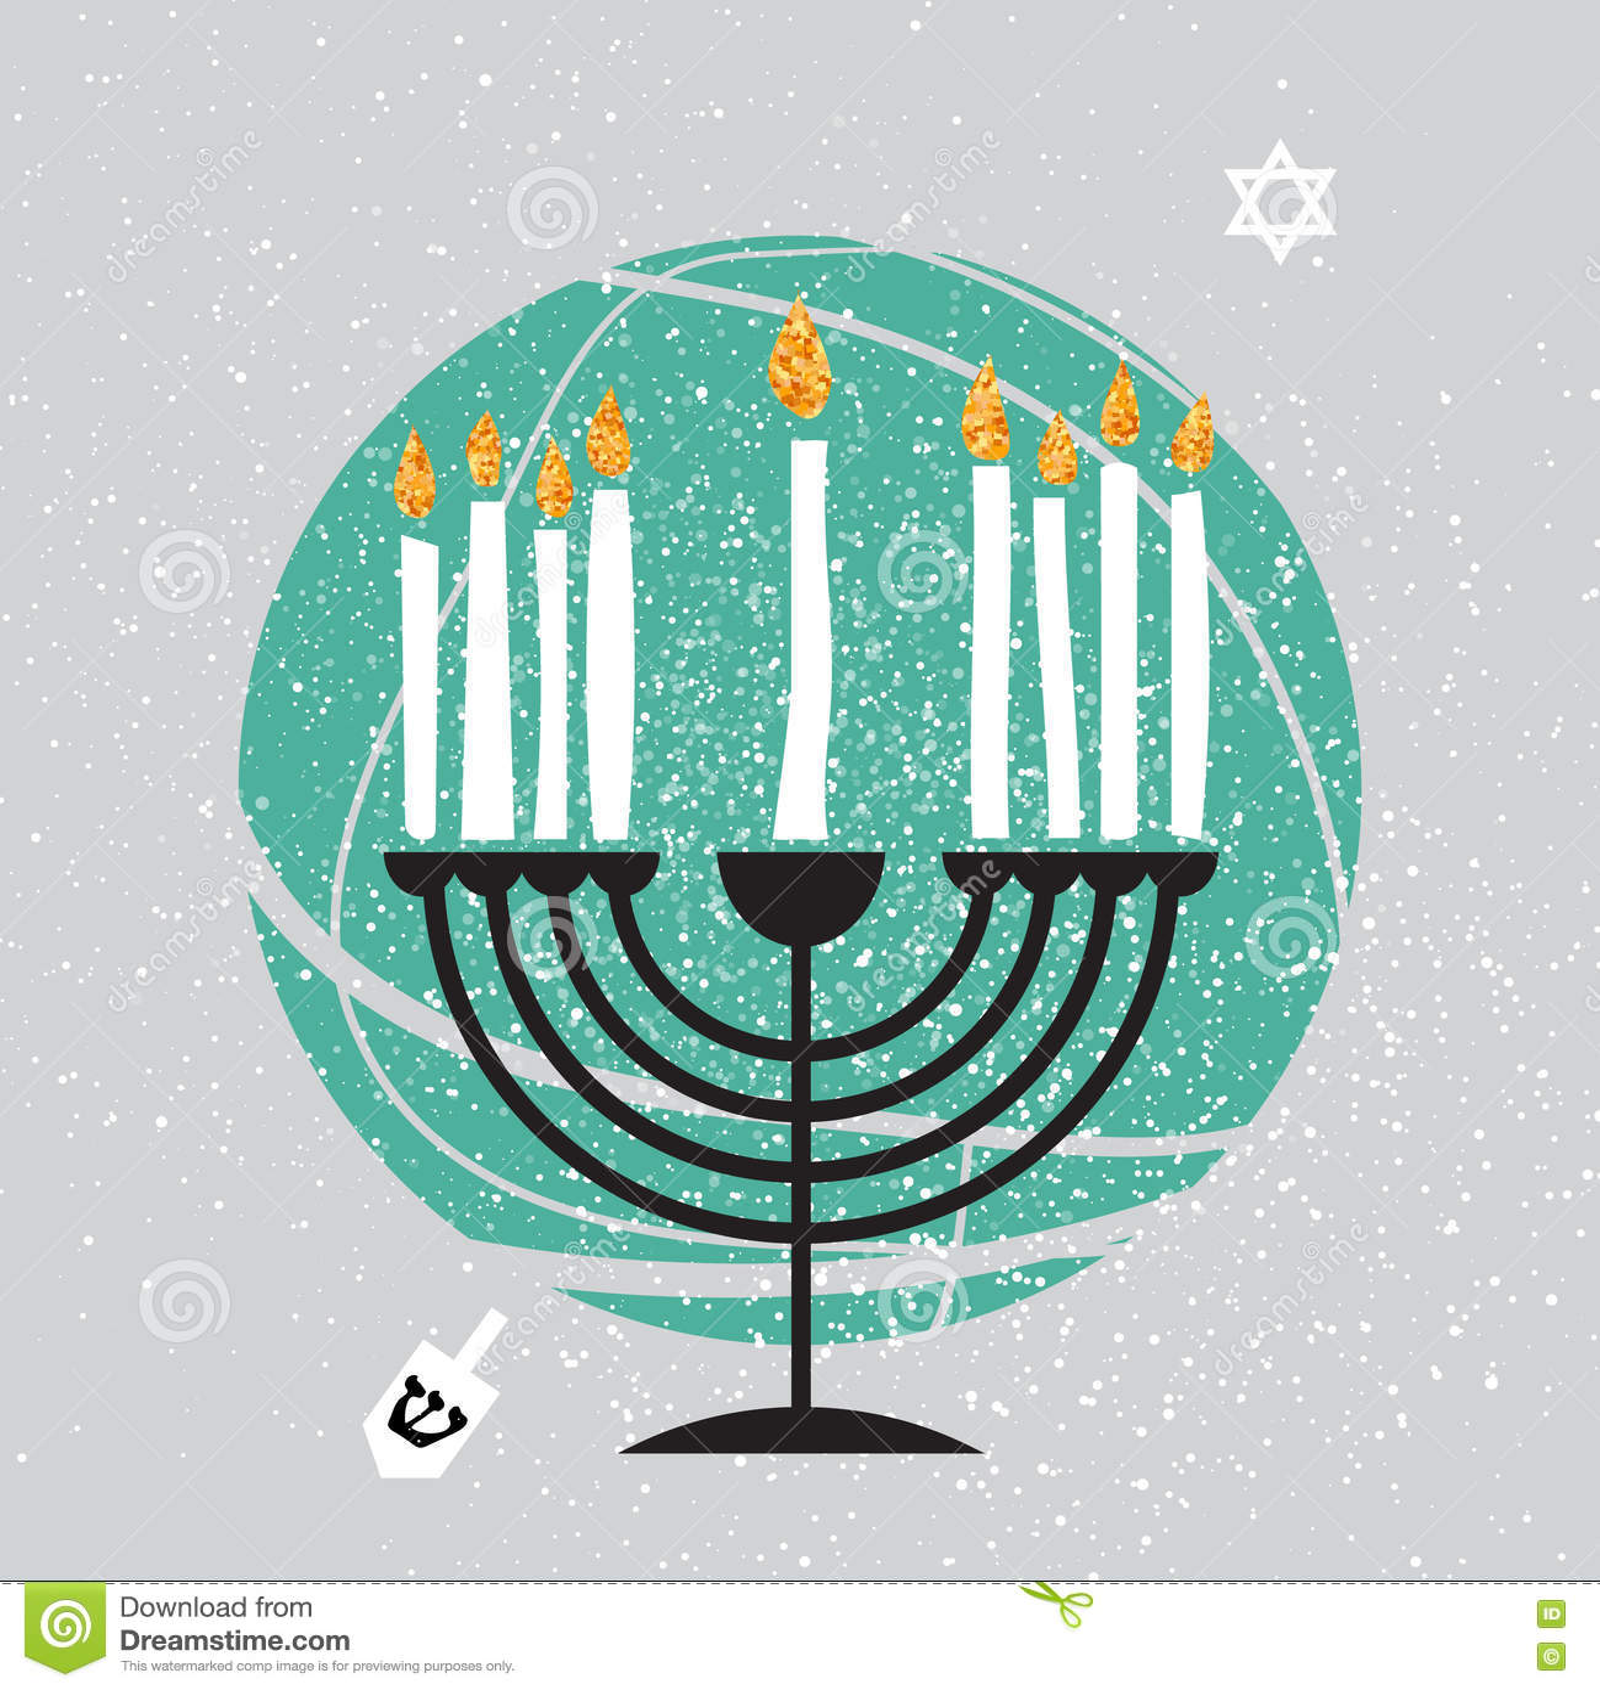 Cute happy hanukkah greeting card jewish holiday with menorah stock download cute happy hanukkah greeting card jewish holiday with menorah stock illustration illustration of m4hsunfo